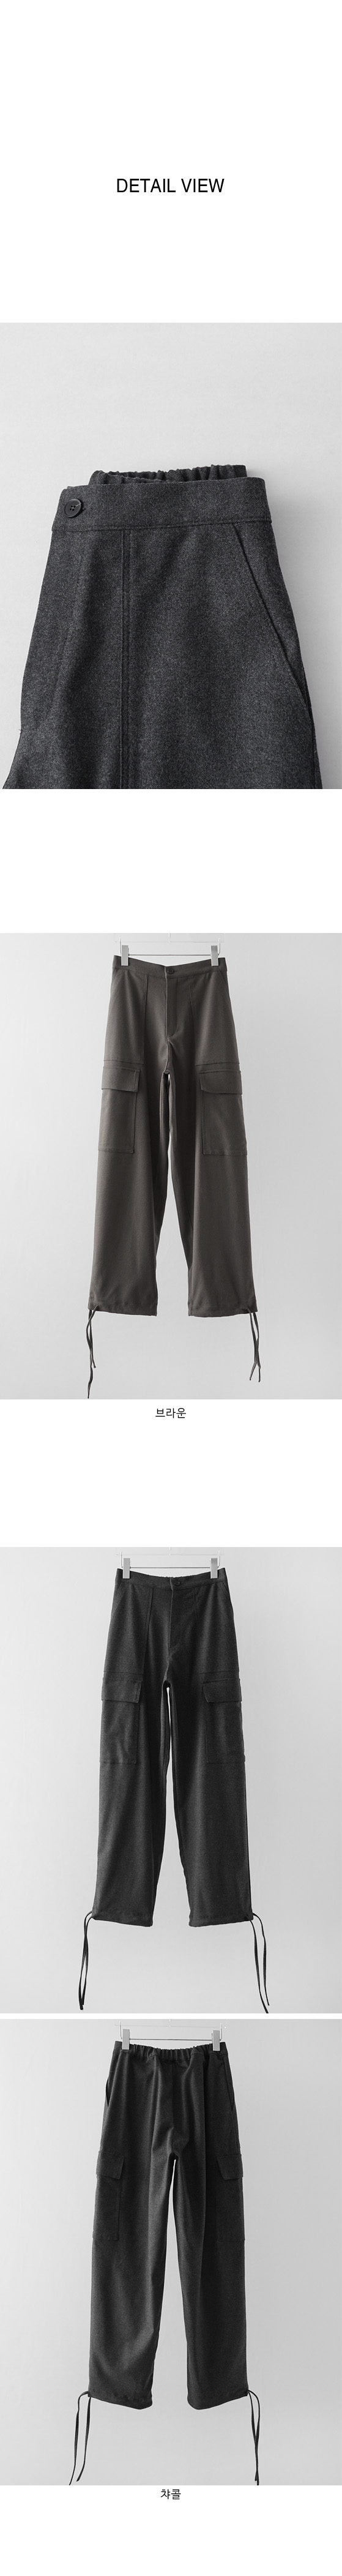 flexible cargo pants